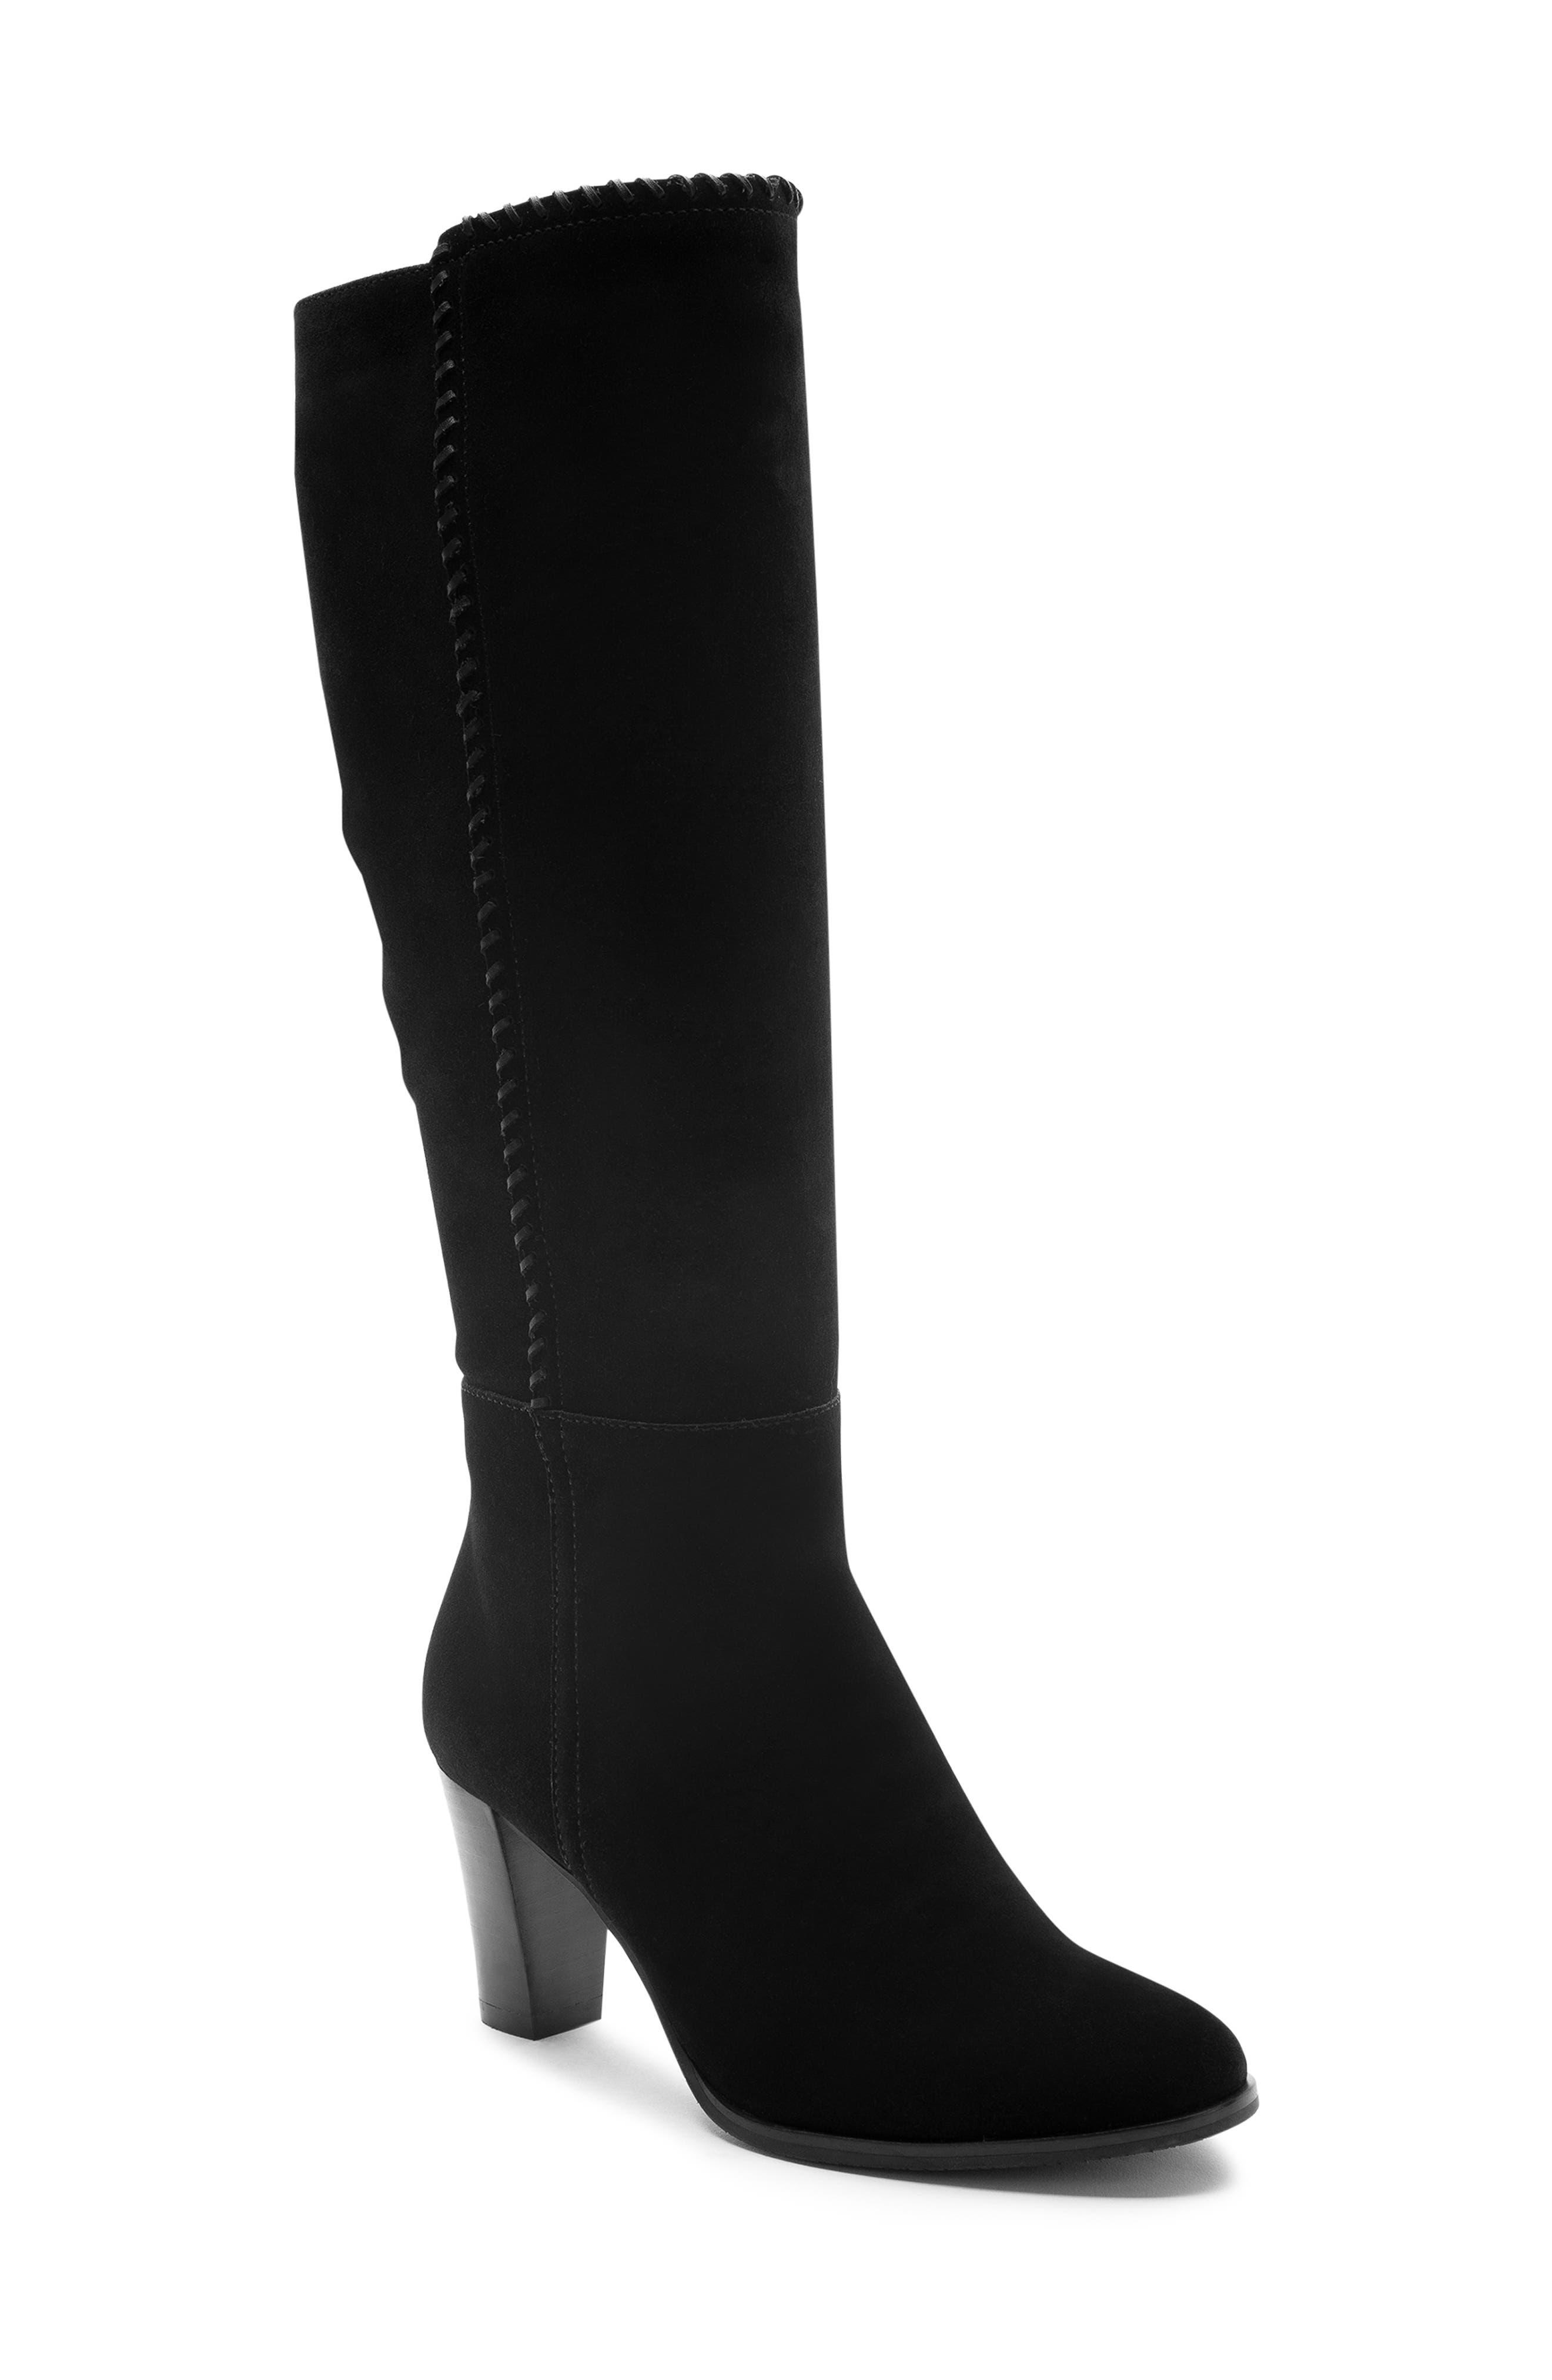 BLONDO Edith Knee-High Waterproof Suede Boot, Main, color, BLACK SUEDE